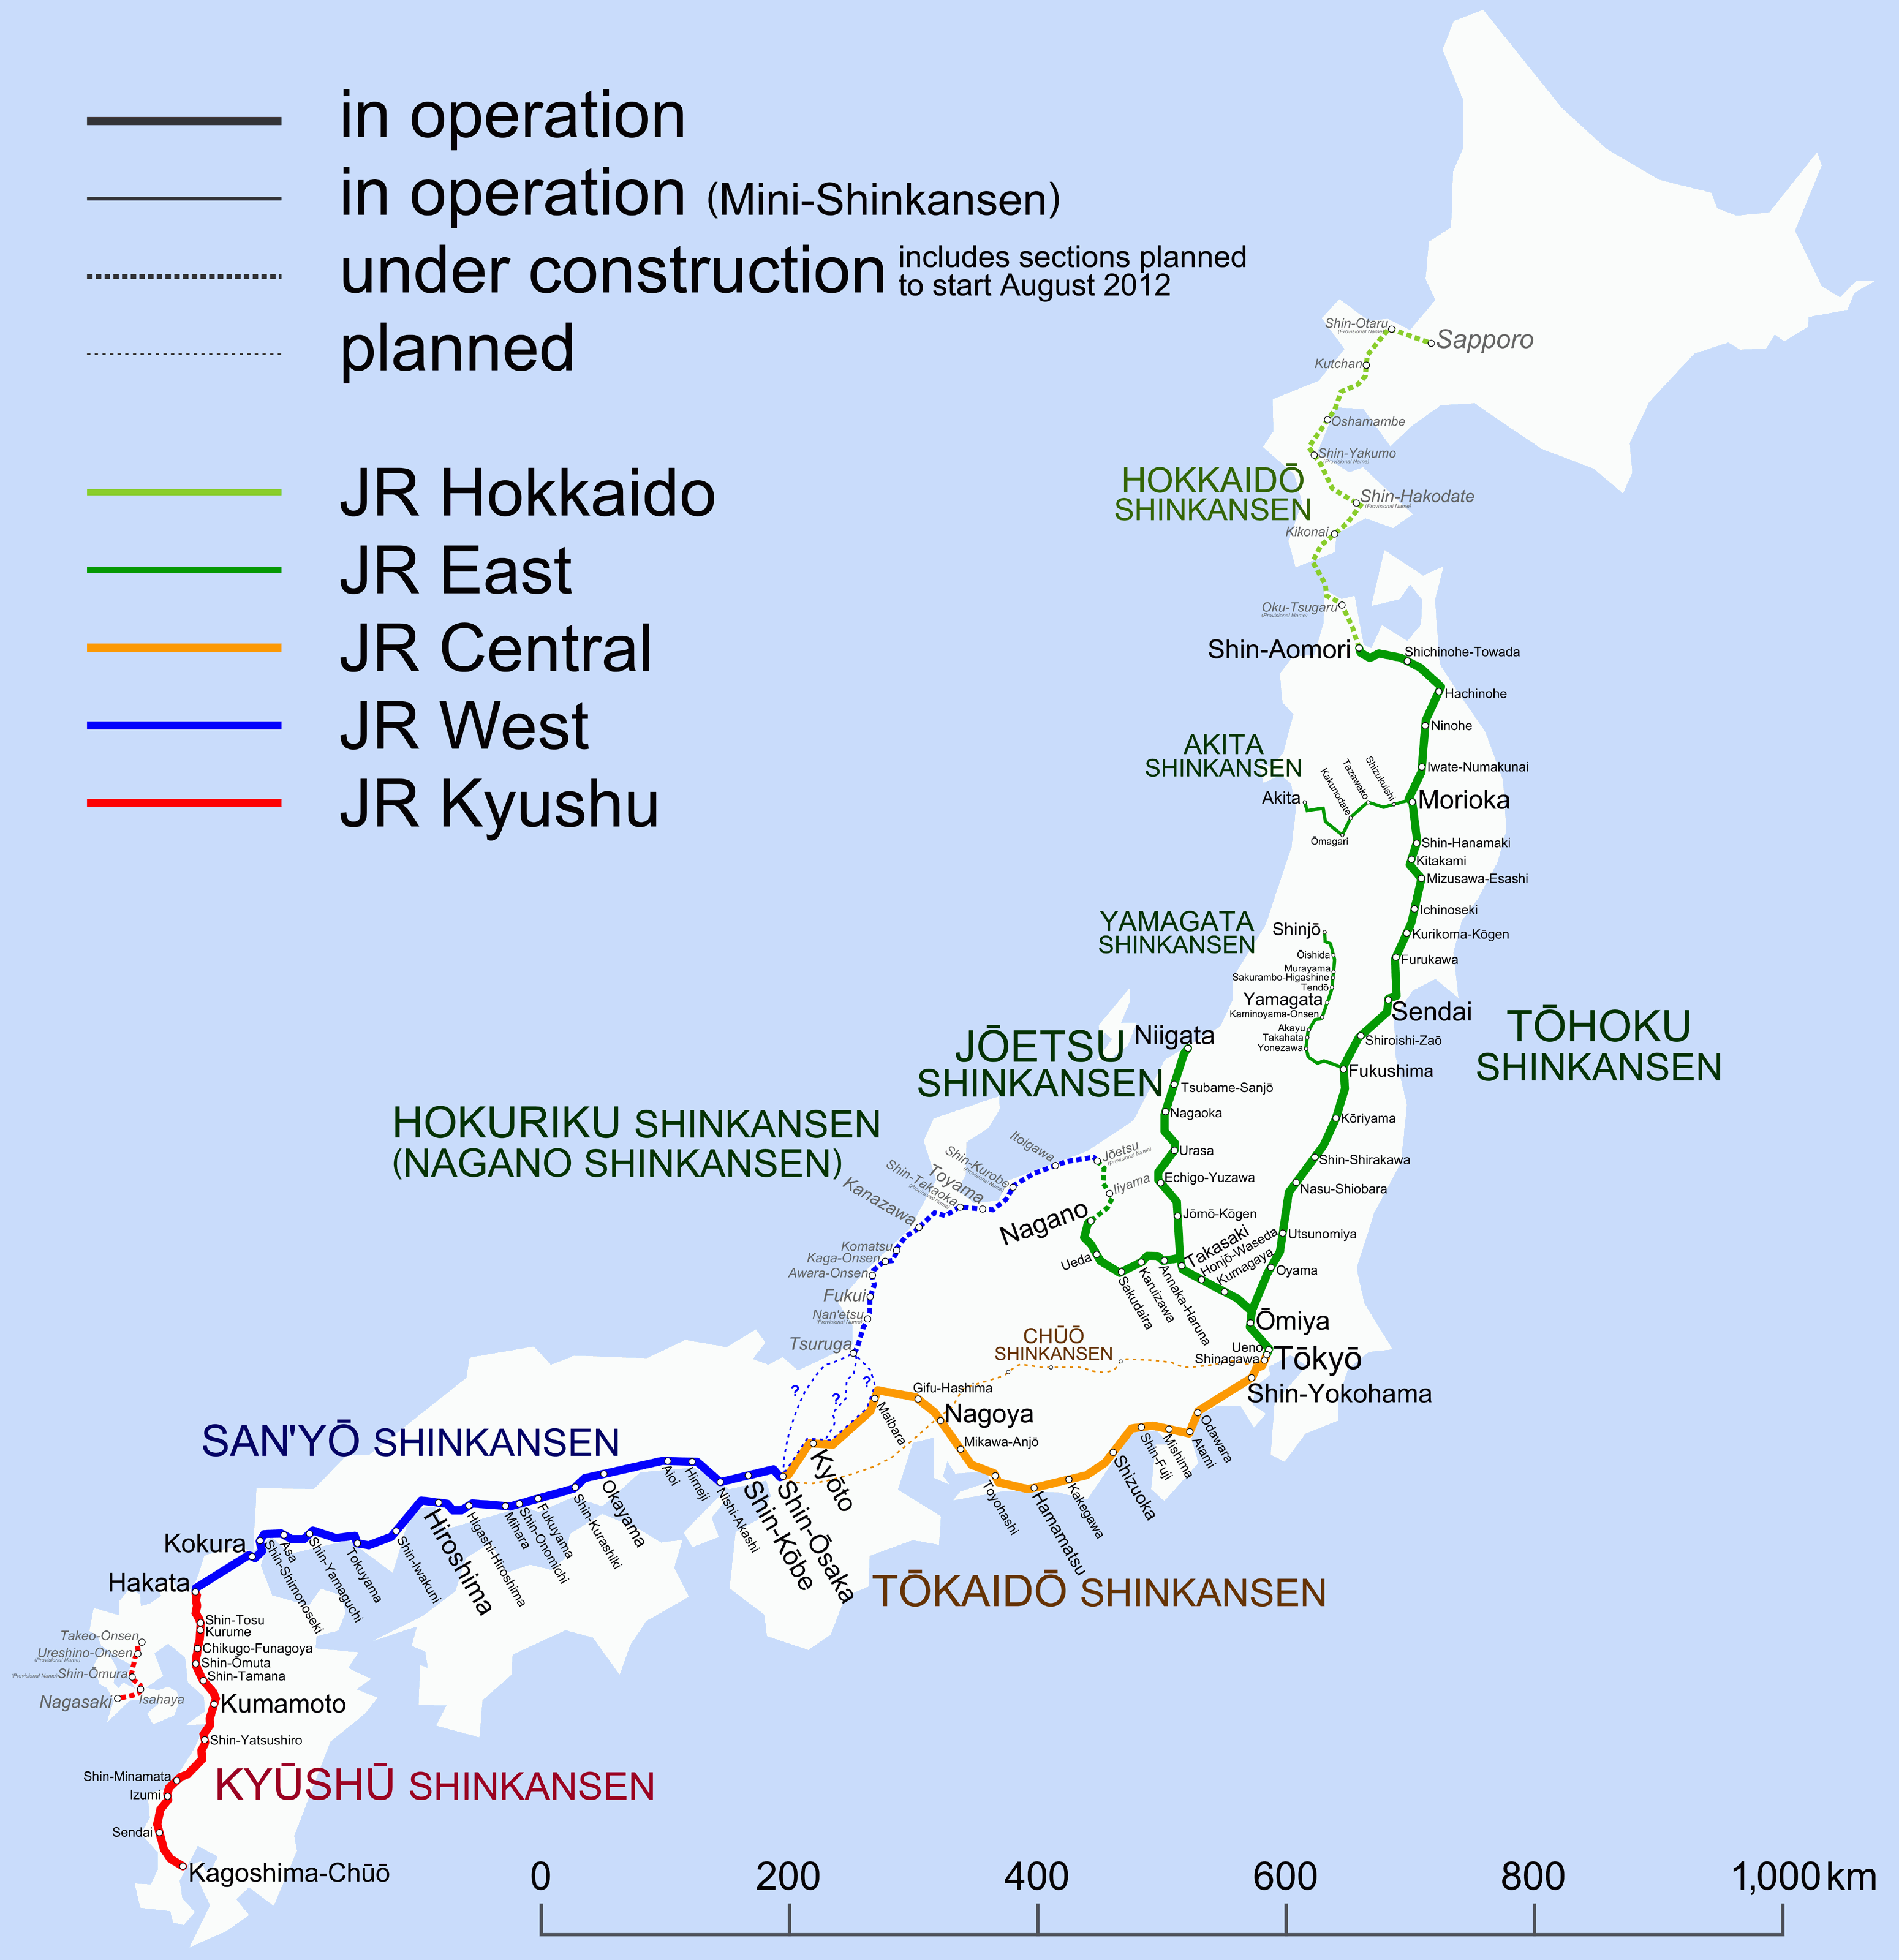 File:Shinkansen map 201208 en.png